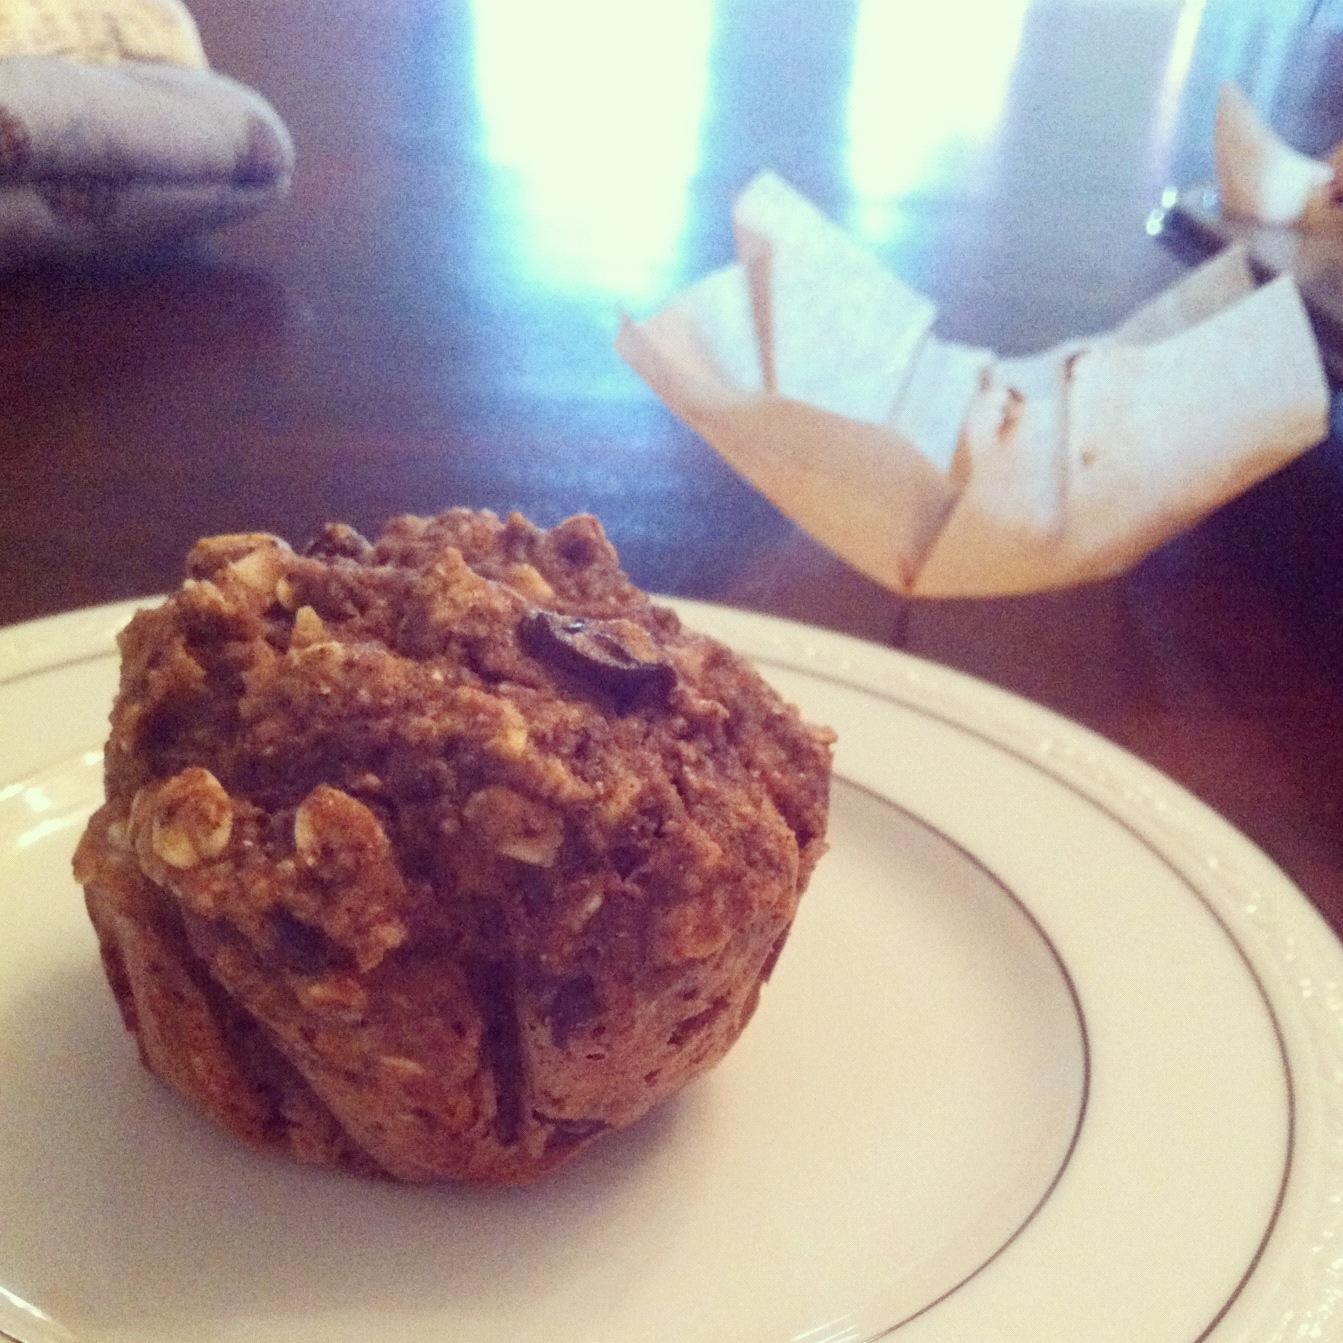 pretty muffin